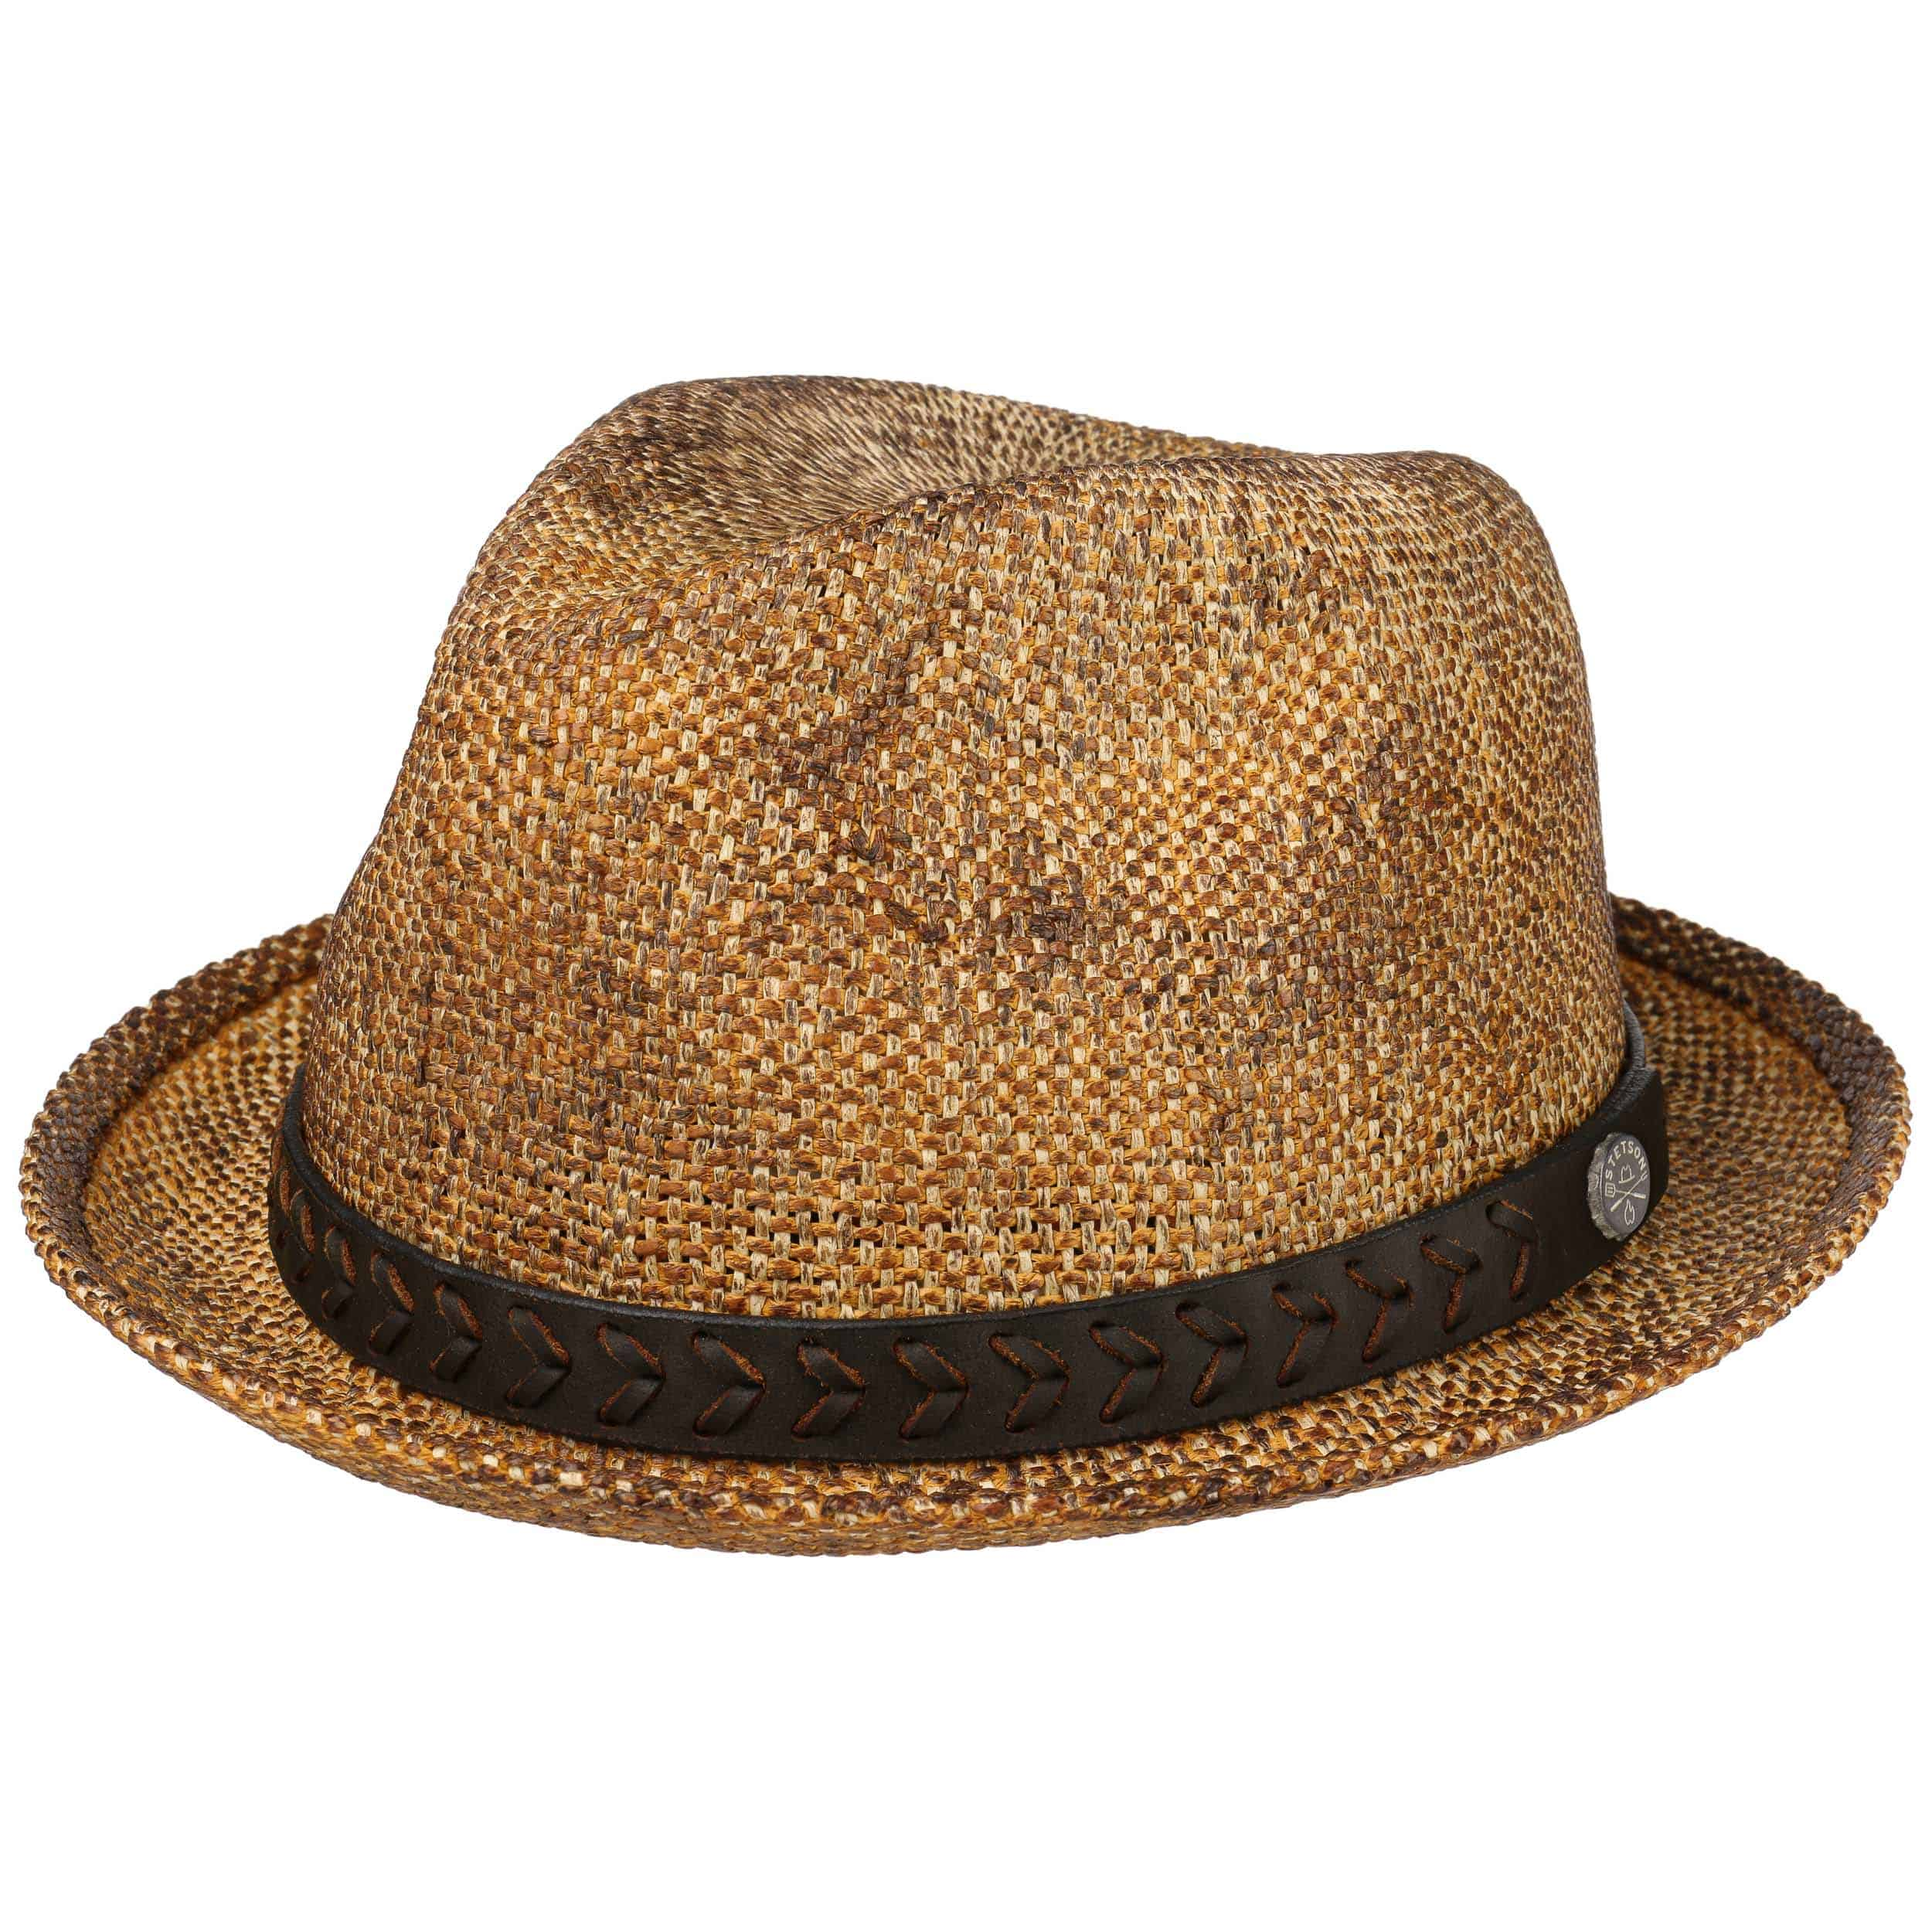 94b691ae0 BBQ Toyo Player Hat Straw Hat by Stetson